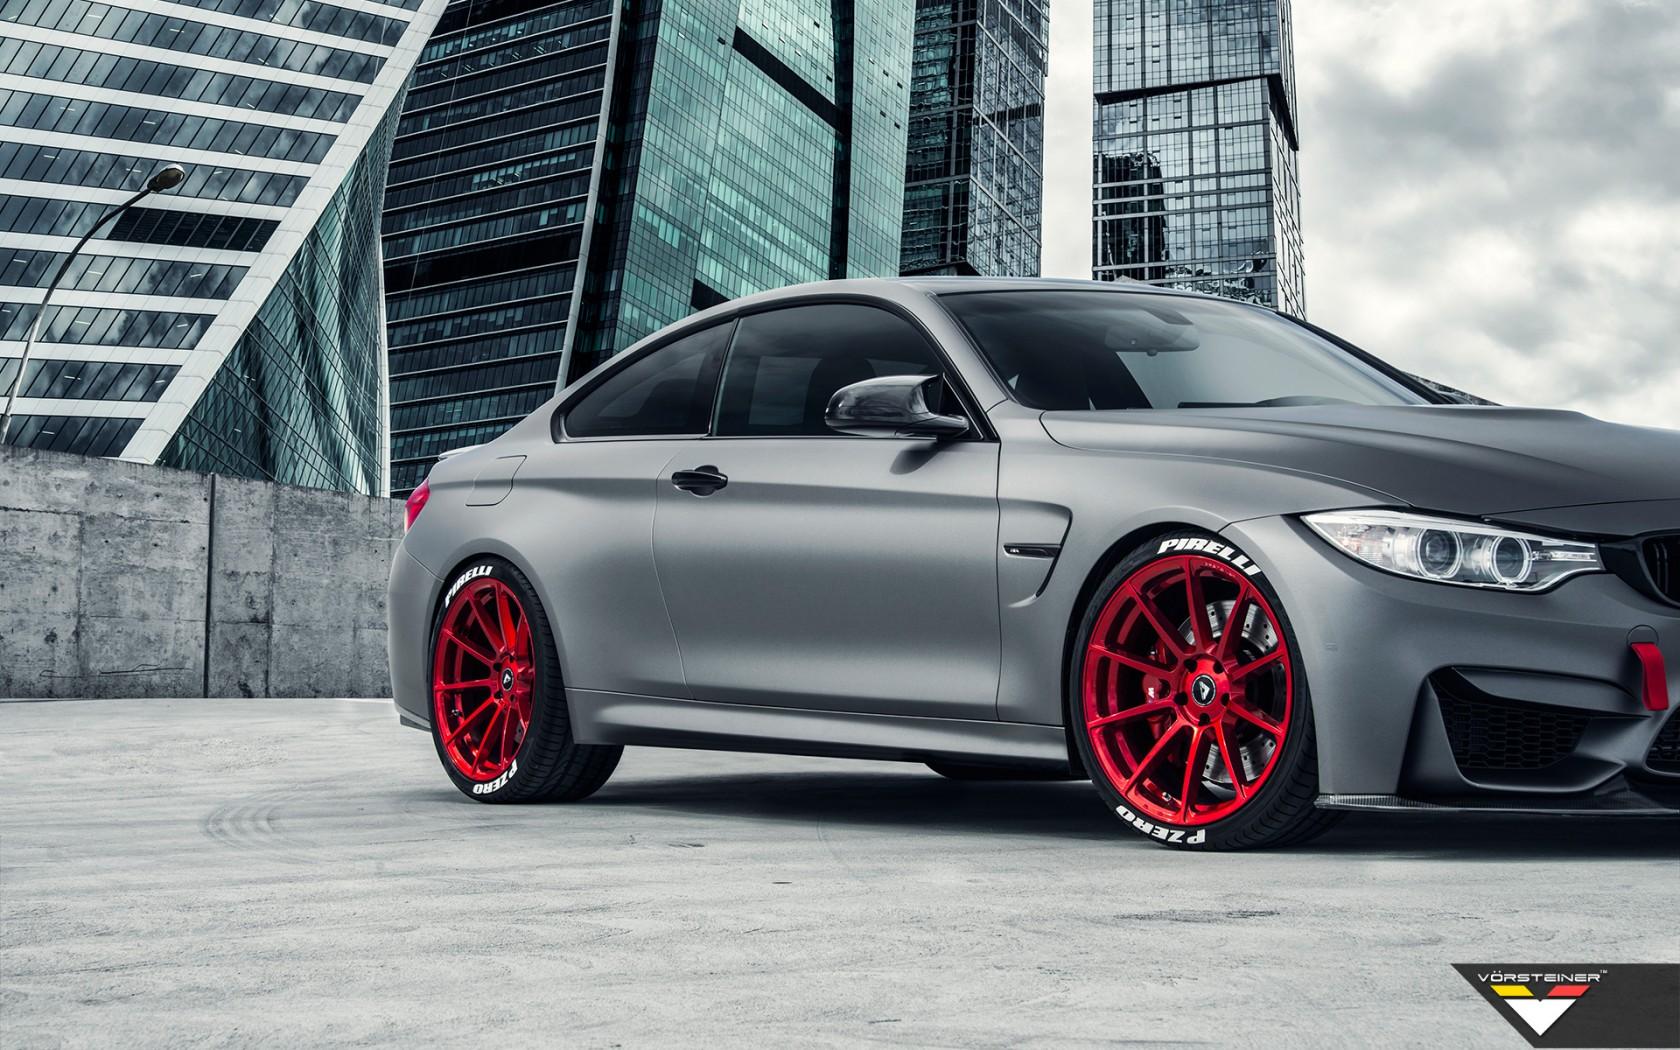 Build A BMW >> Frozen Gray BMW M4 R1 Motorsports Build4 Wallpaper | HD ...